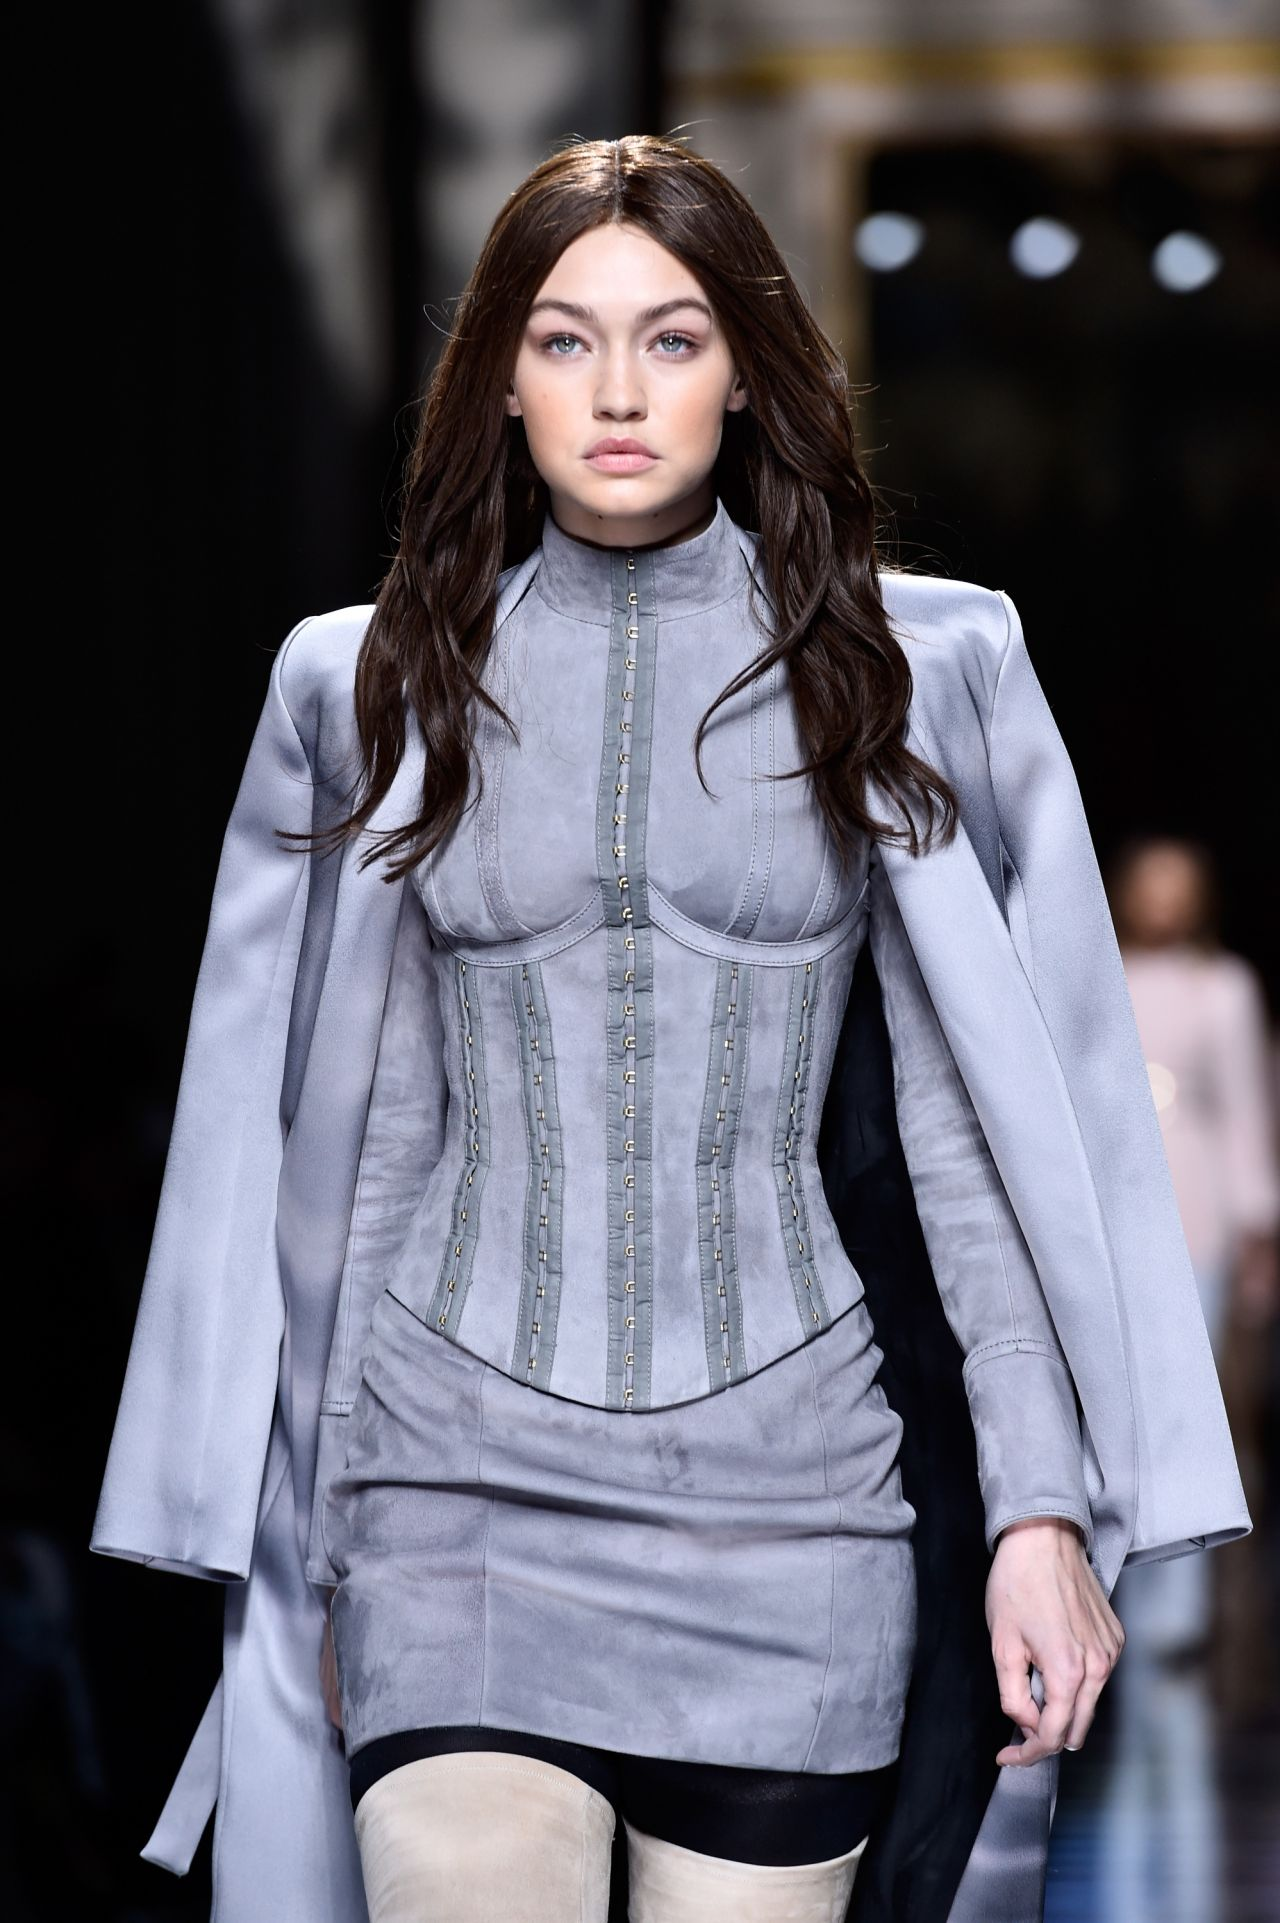 Gigi Hadid - Balmain Fashion Show